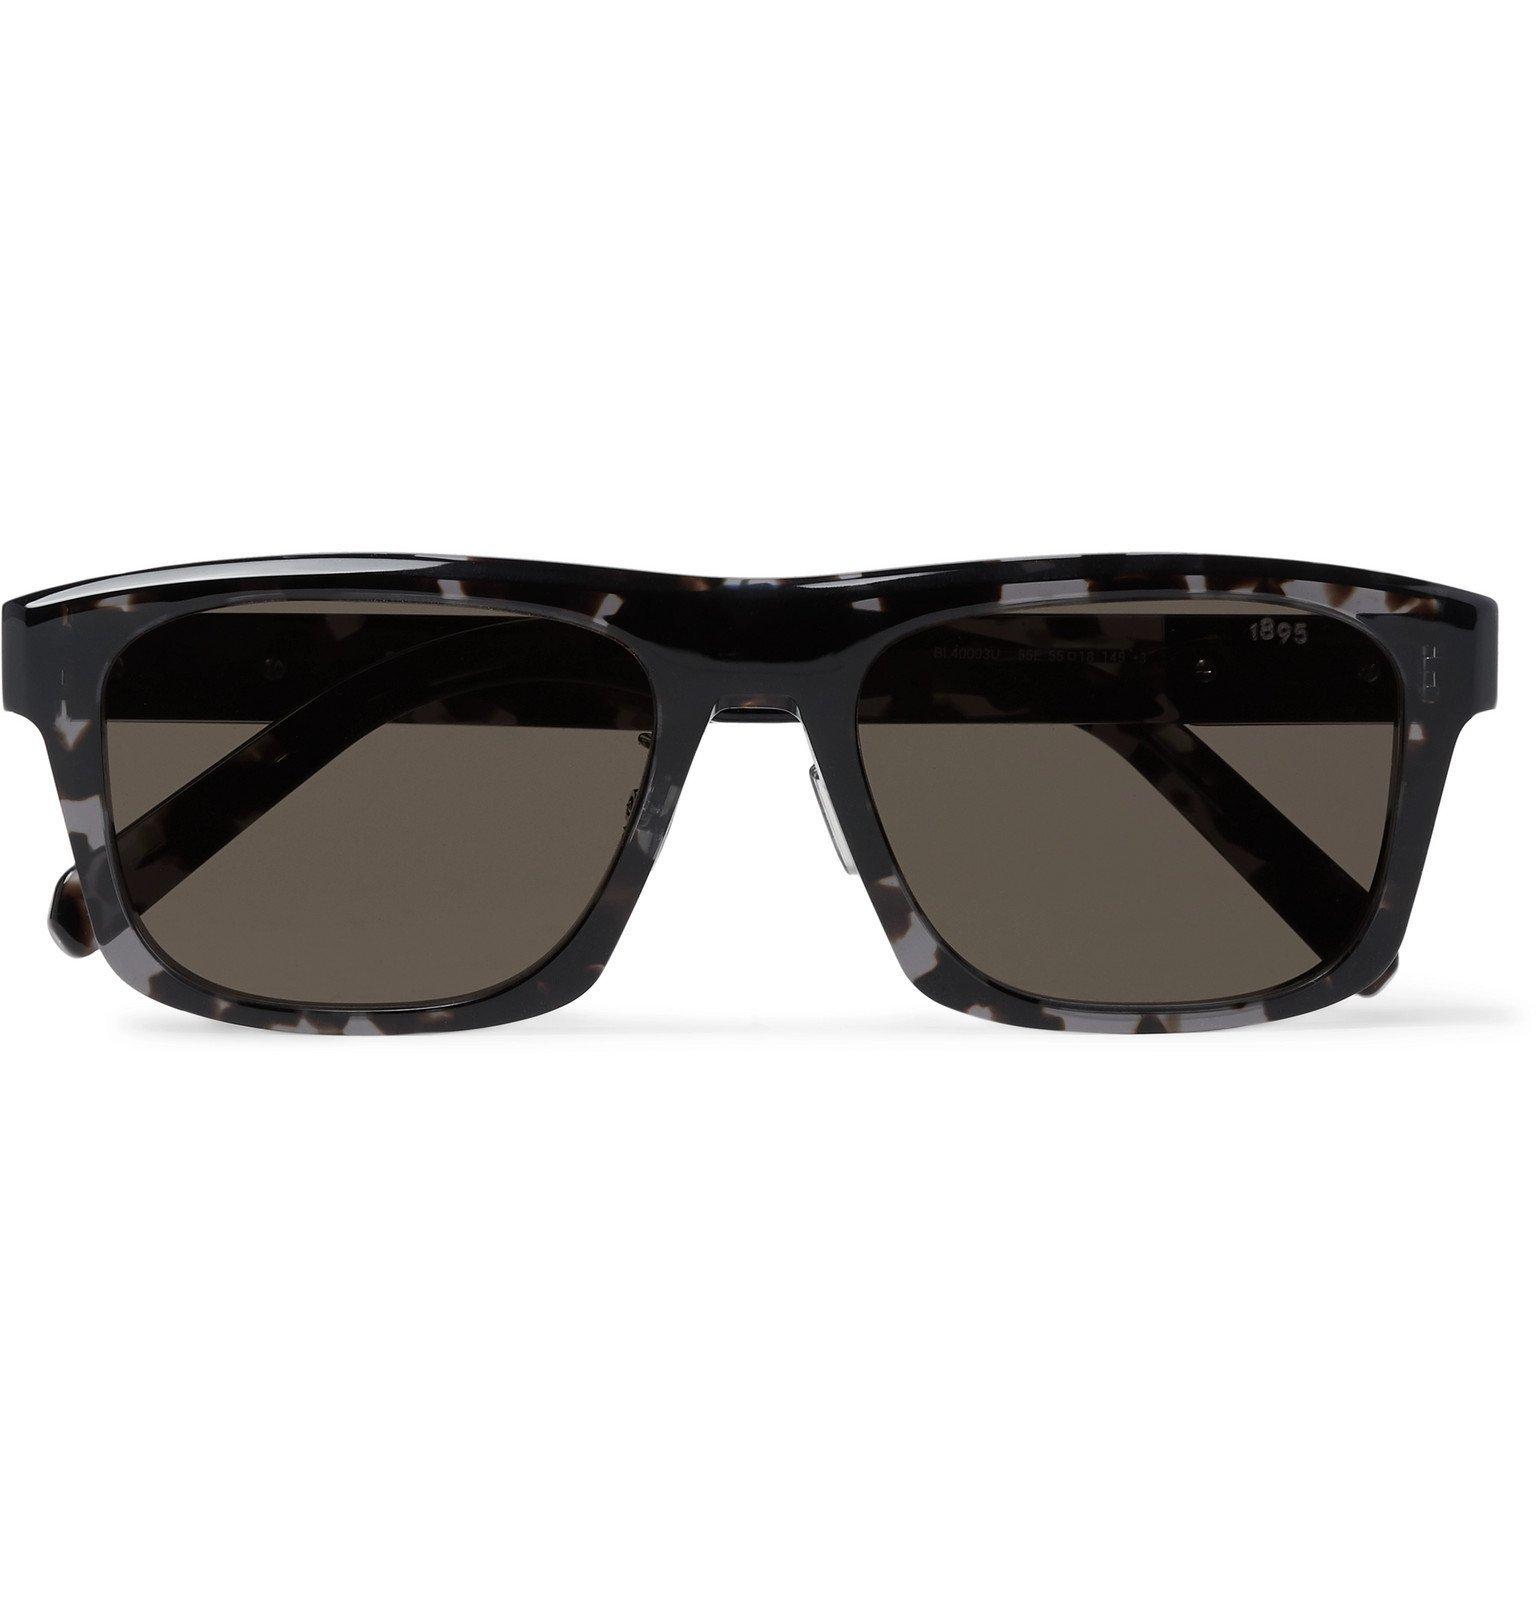 Photo: Berluti - Square-Frame Tortoiseshell Acetate Mirrored Sunglasses - Tortoiseshell